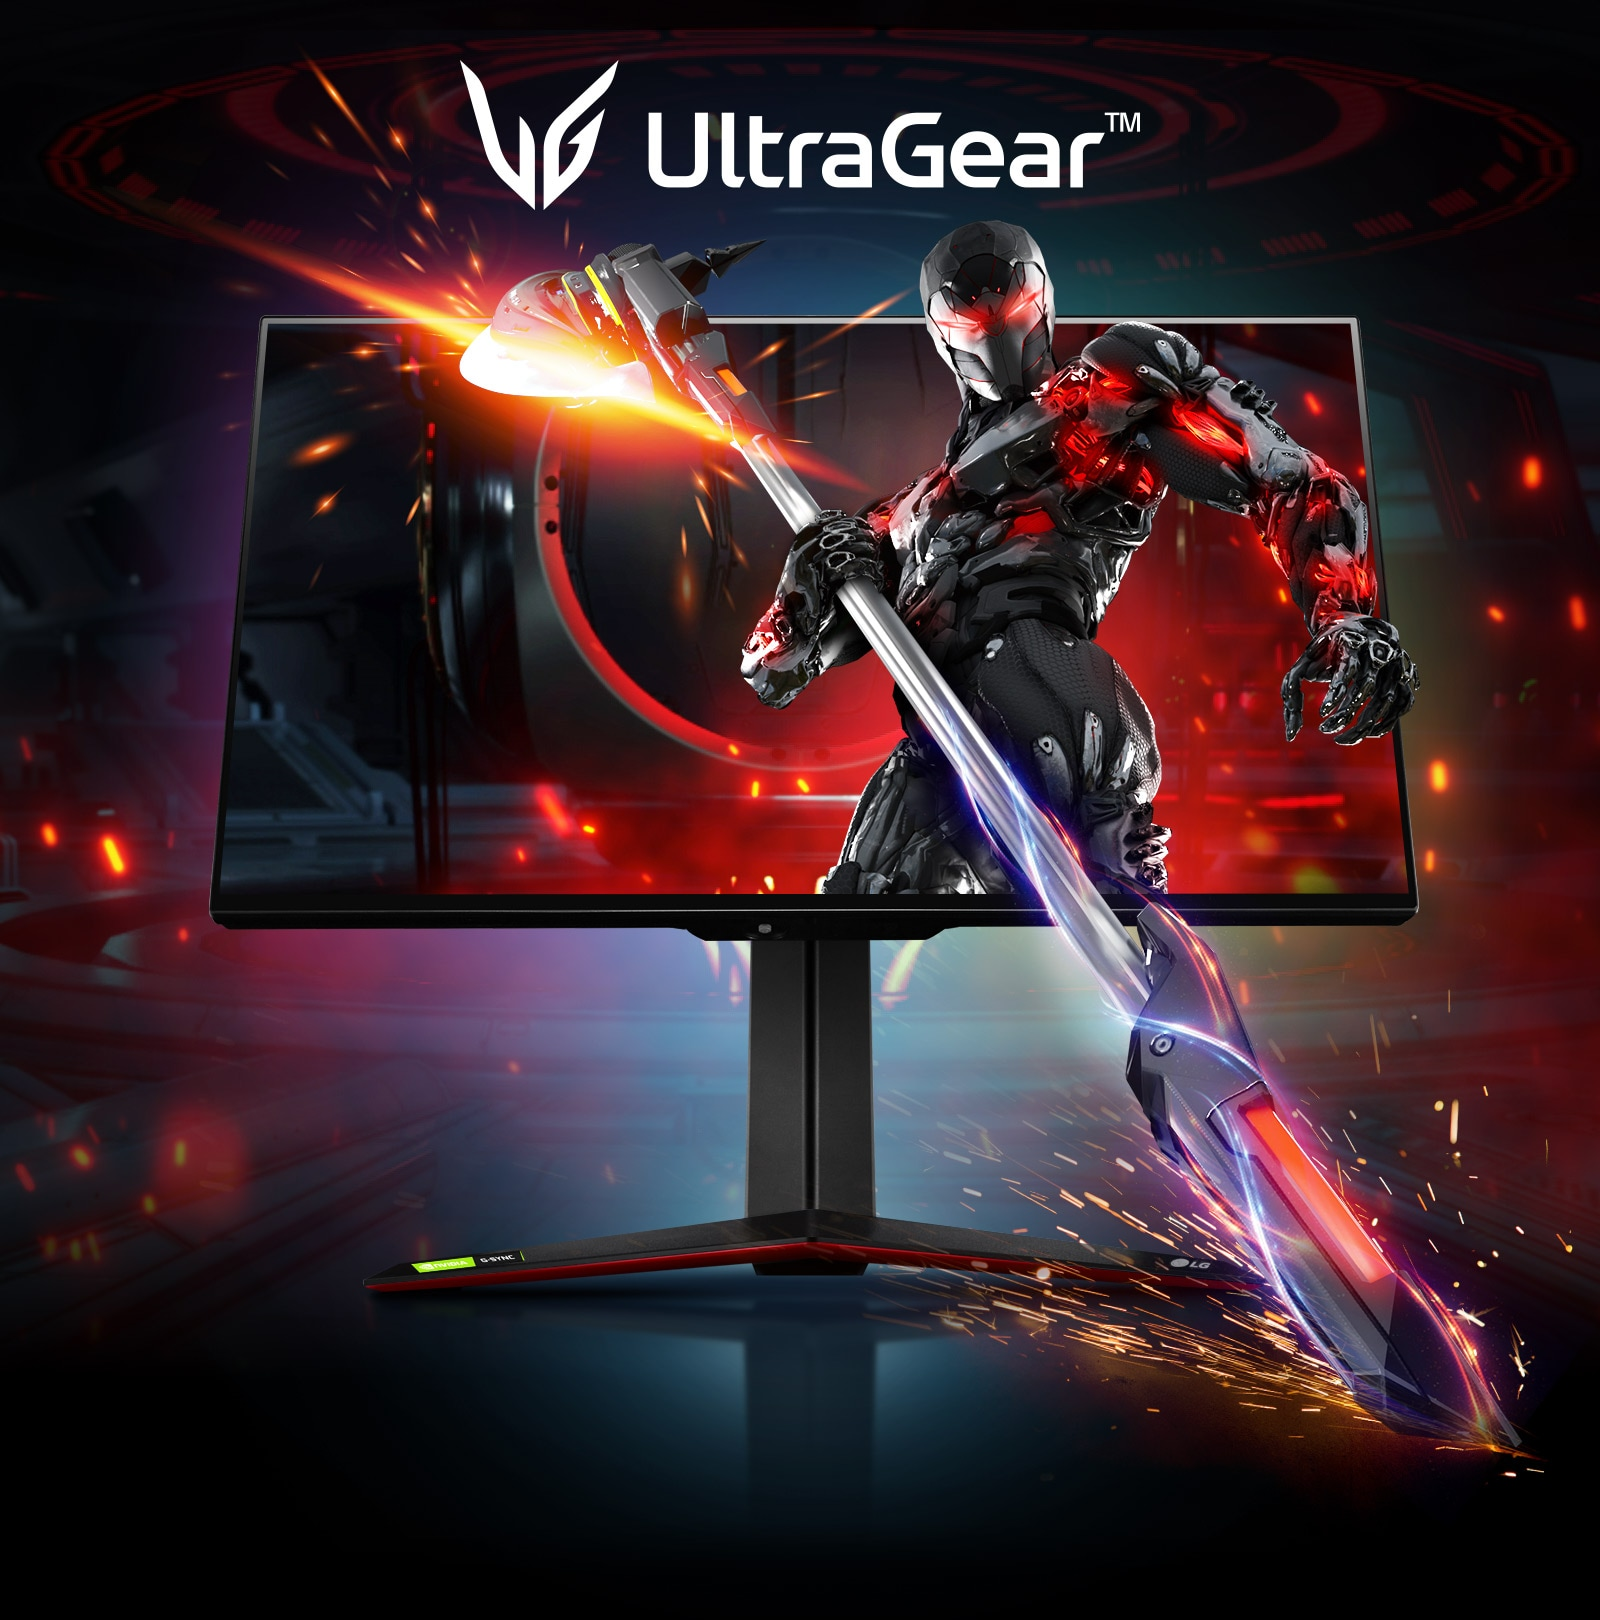 (No translation: Logo) UltraGear™